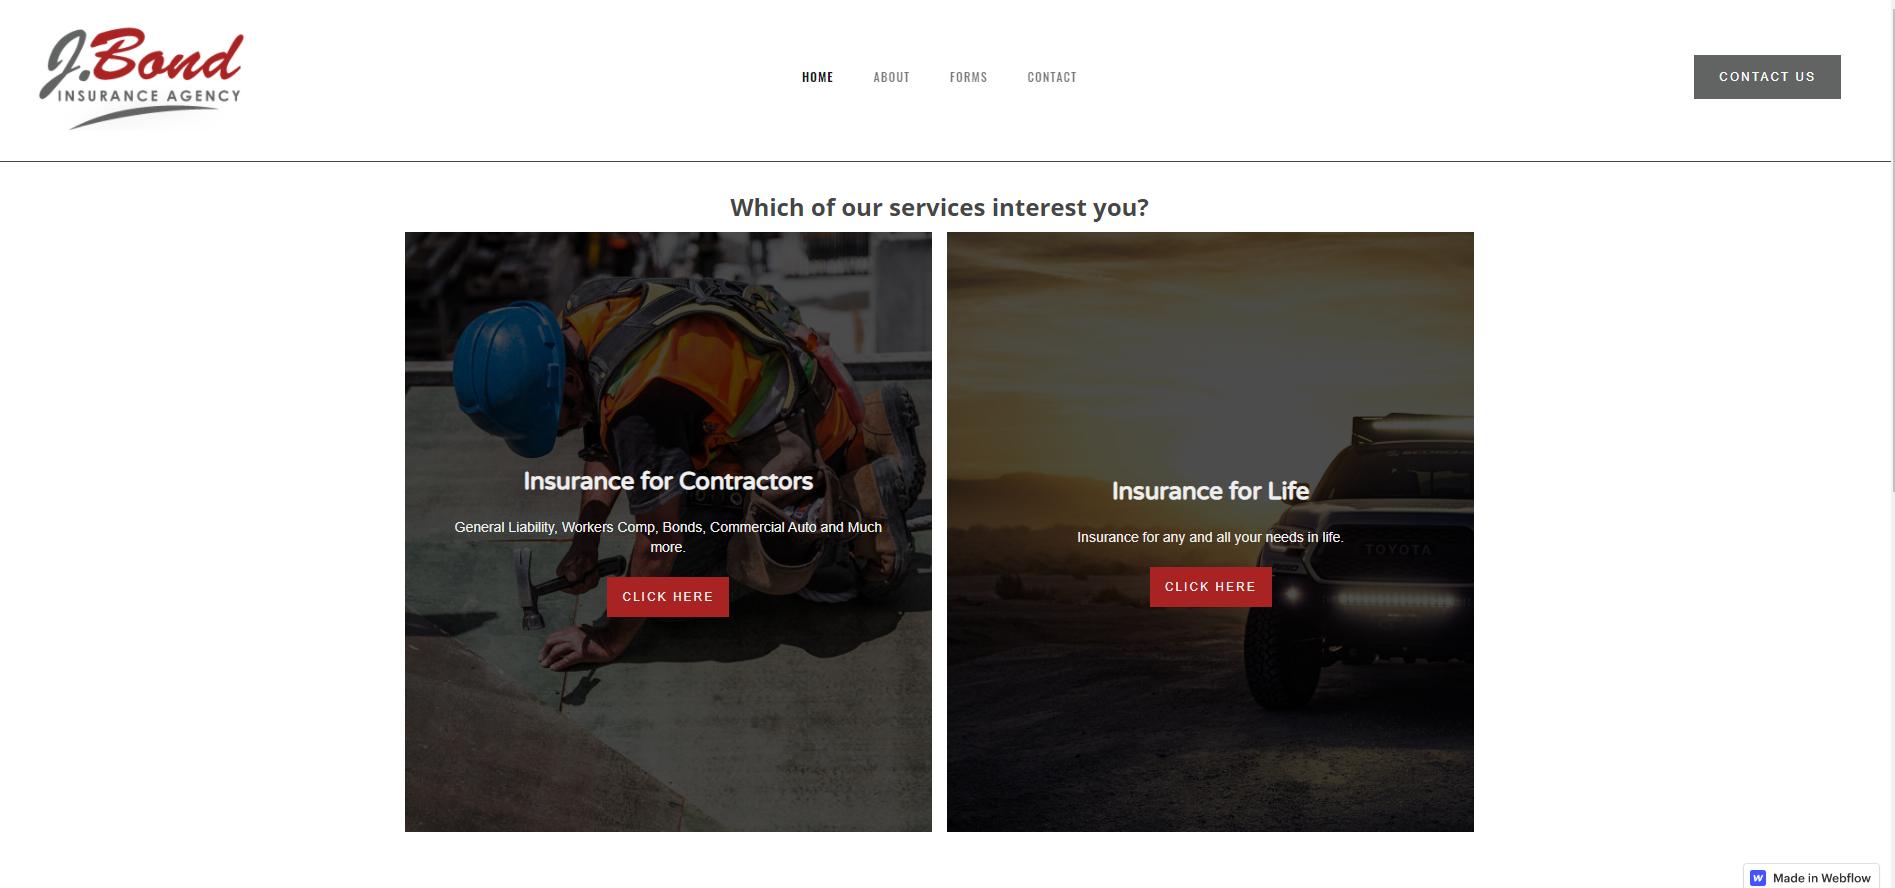 J bond insurance project screenshot